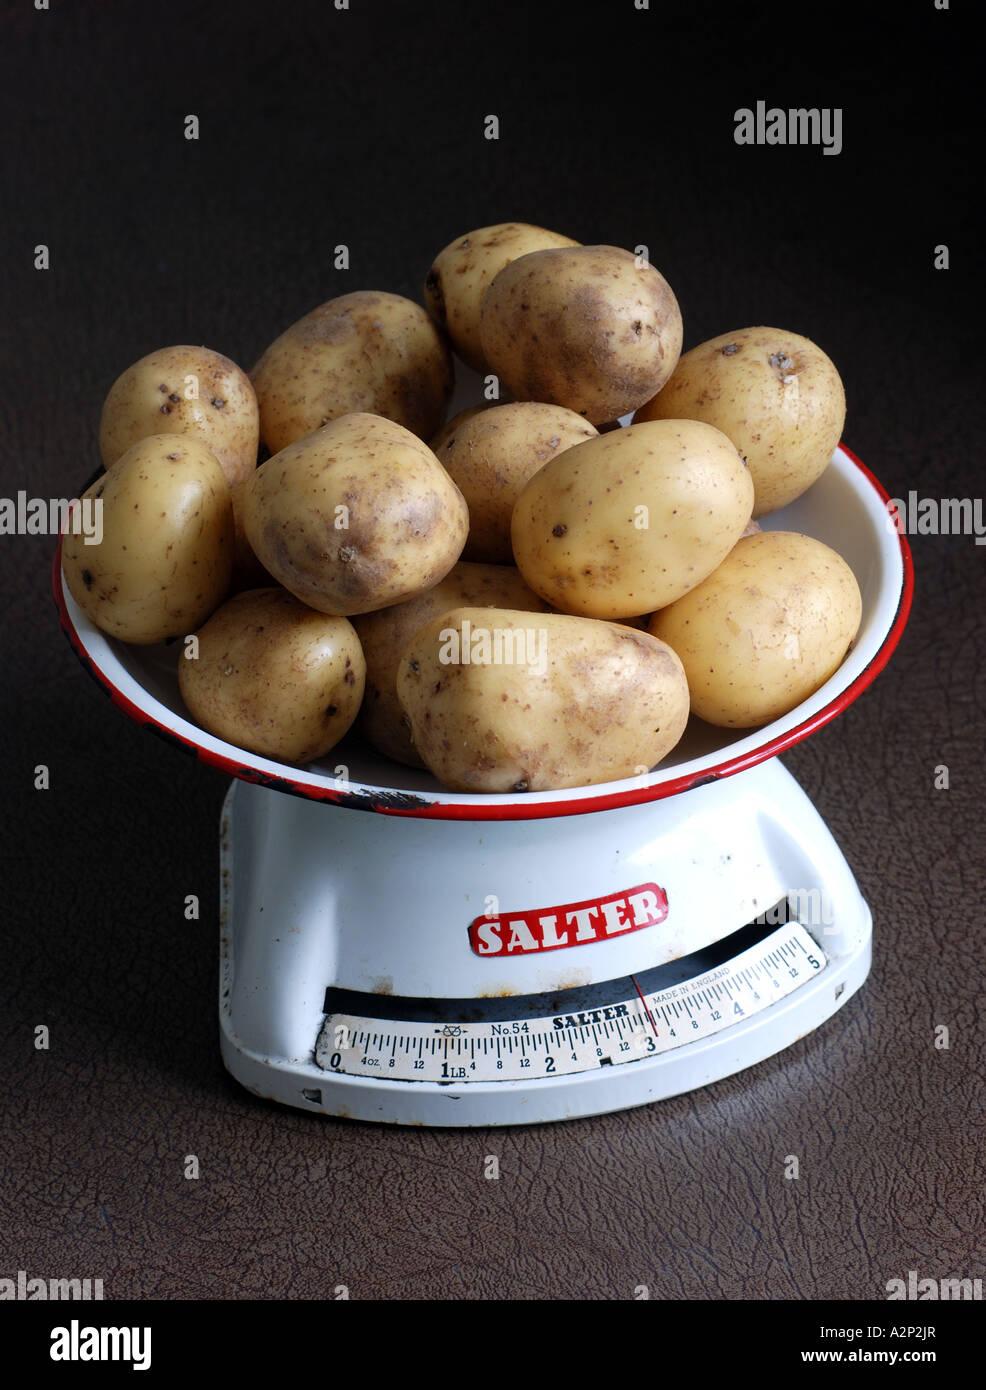 Potatoes variety Vivaldi on scales - Stock Image